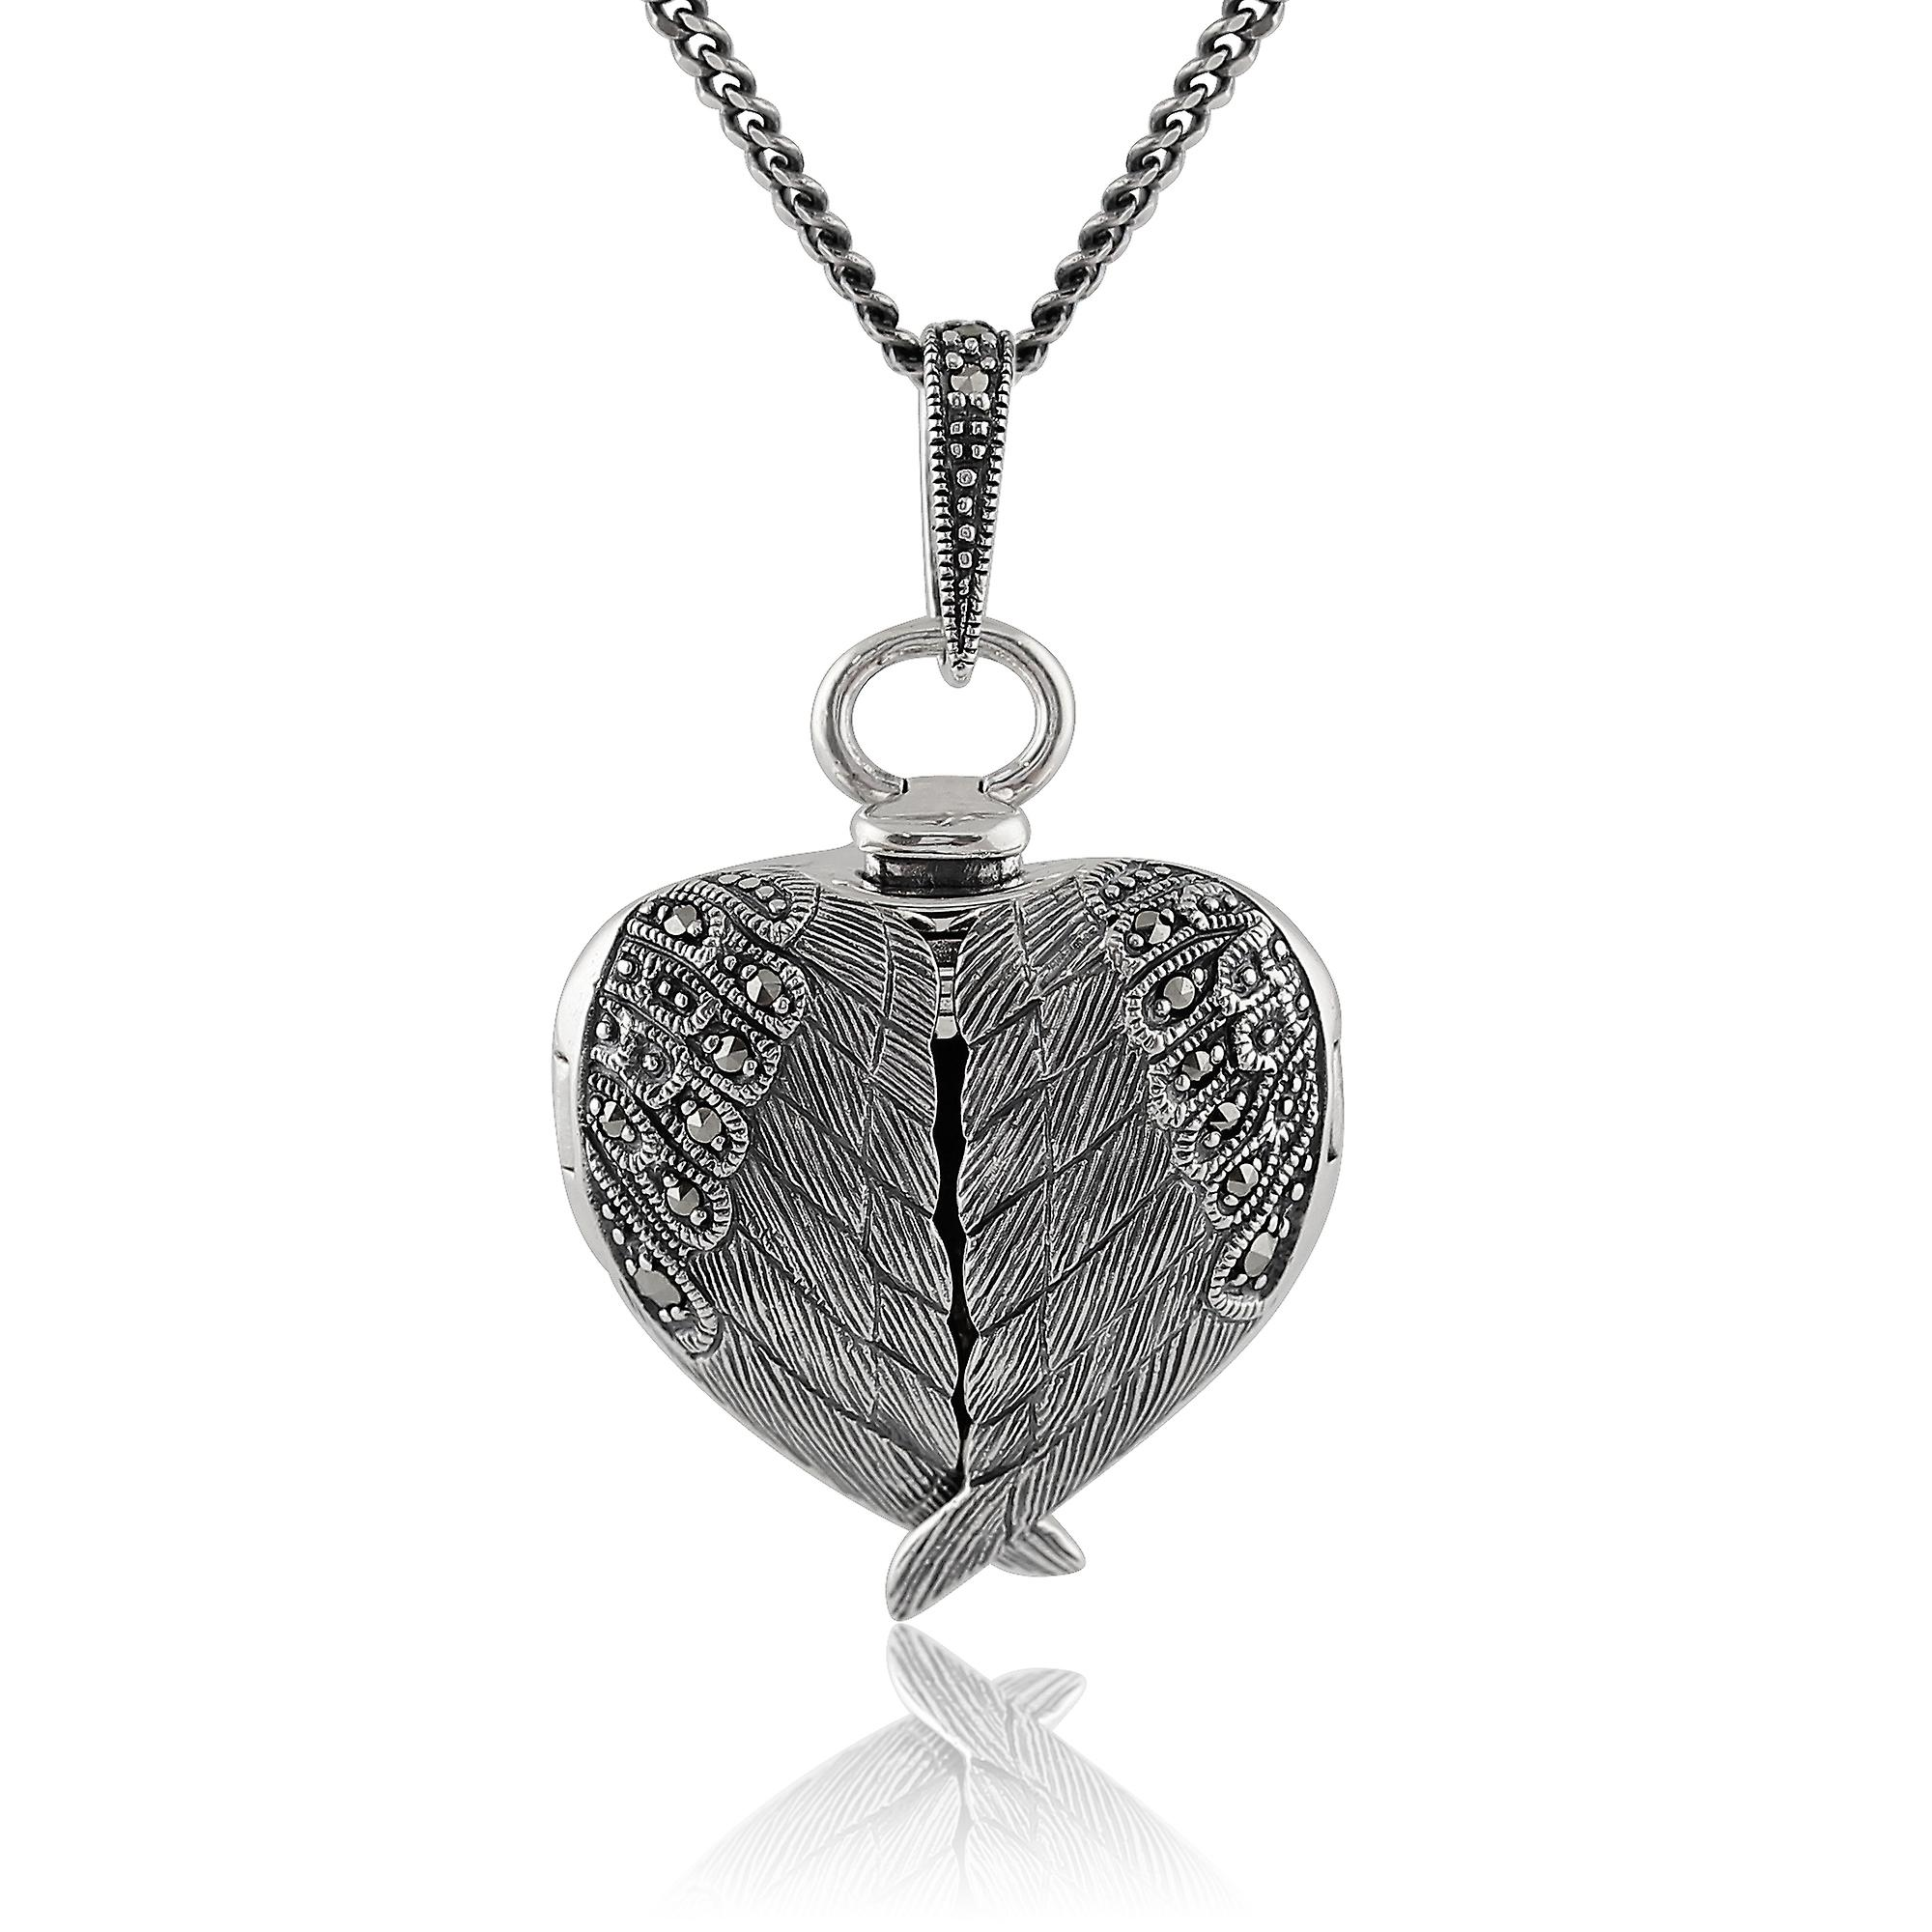 Gemondo Sterling Silver 0.14ct Marcasite Angel Wing Heart Locket 45cm Necklace